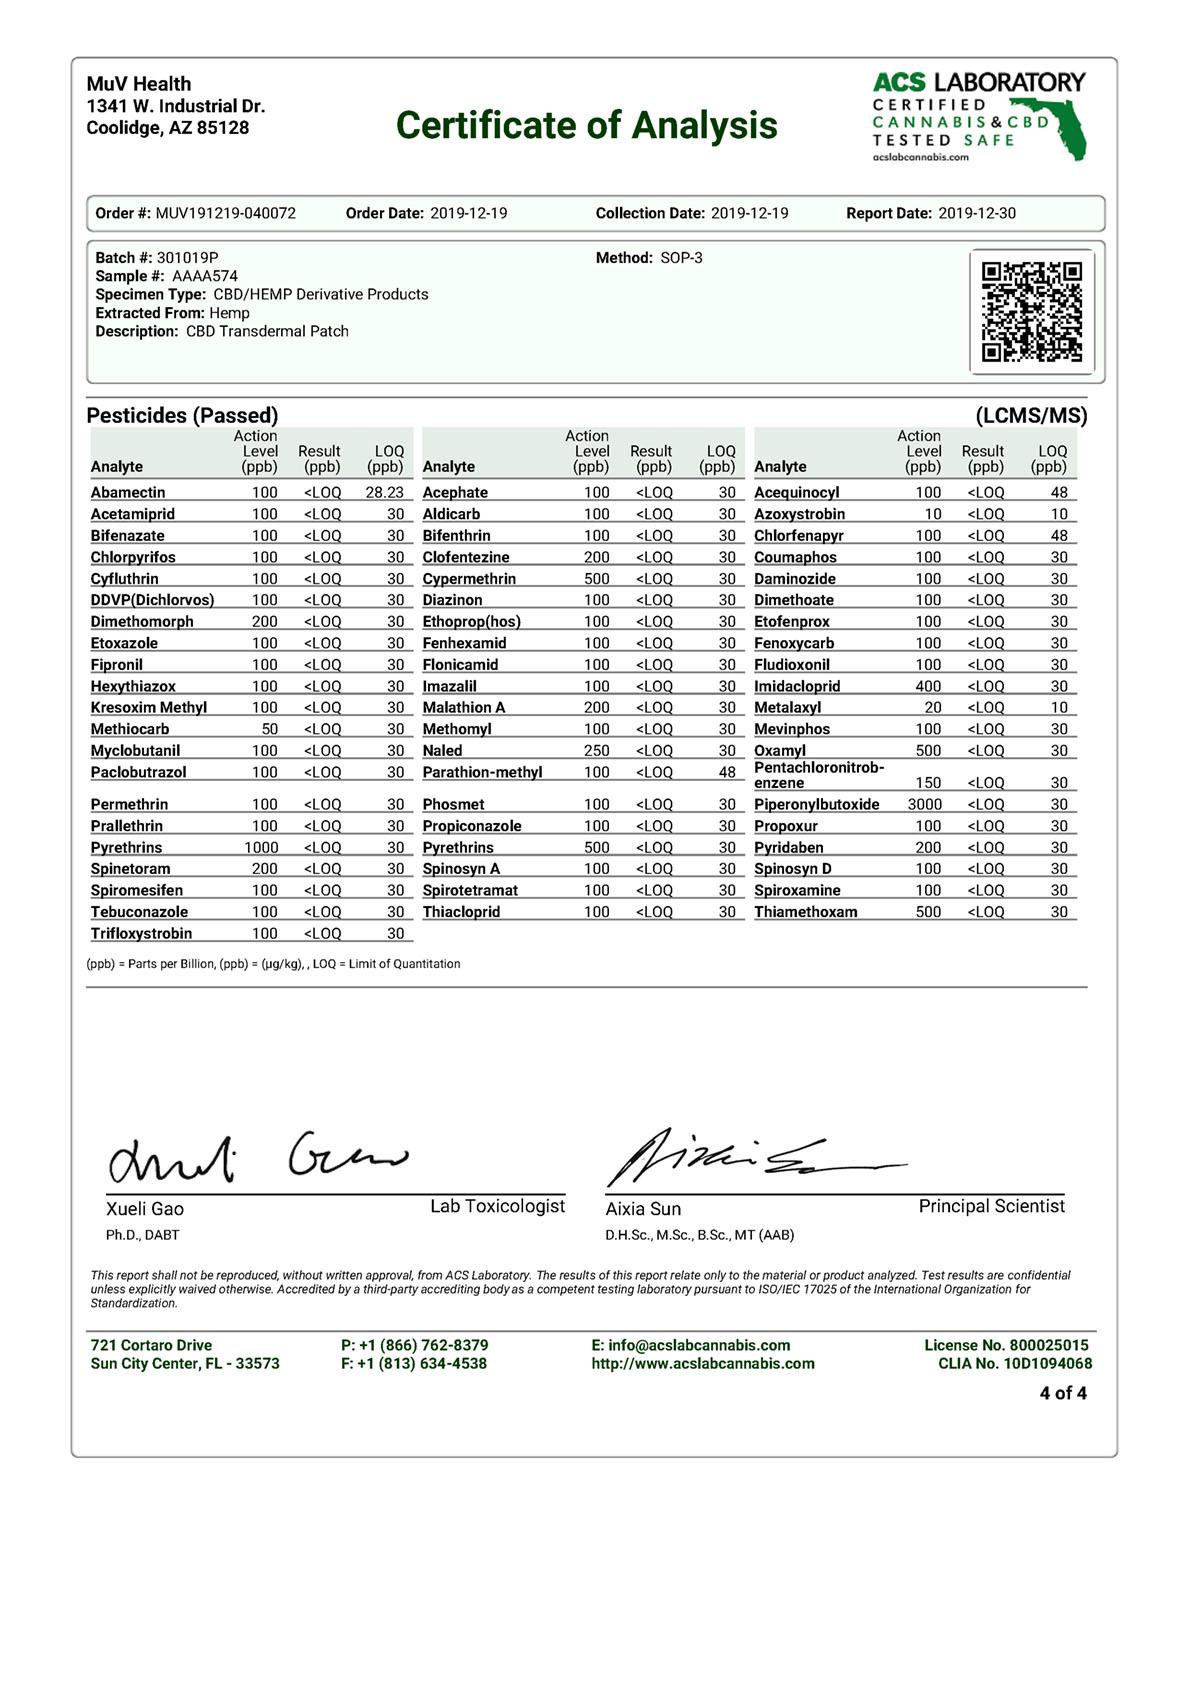 muv-cbd-transdermal-patch-coa-301019p-page-4.jpg